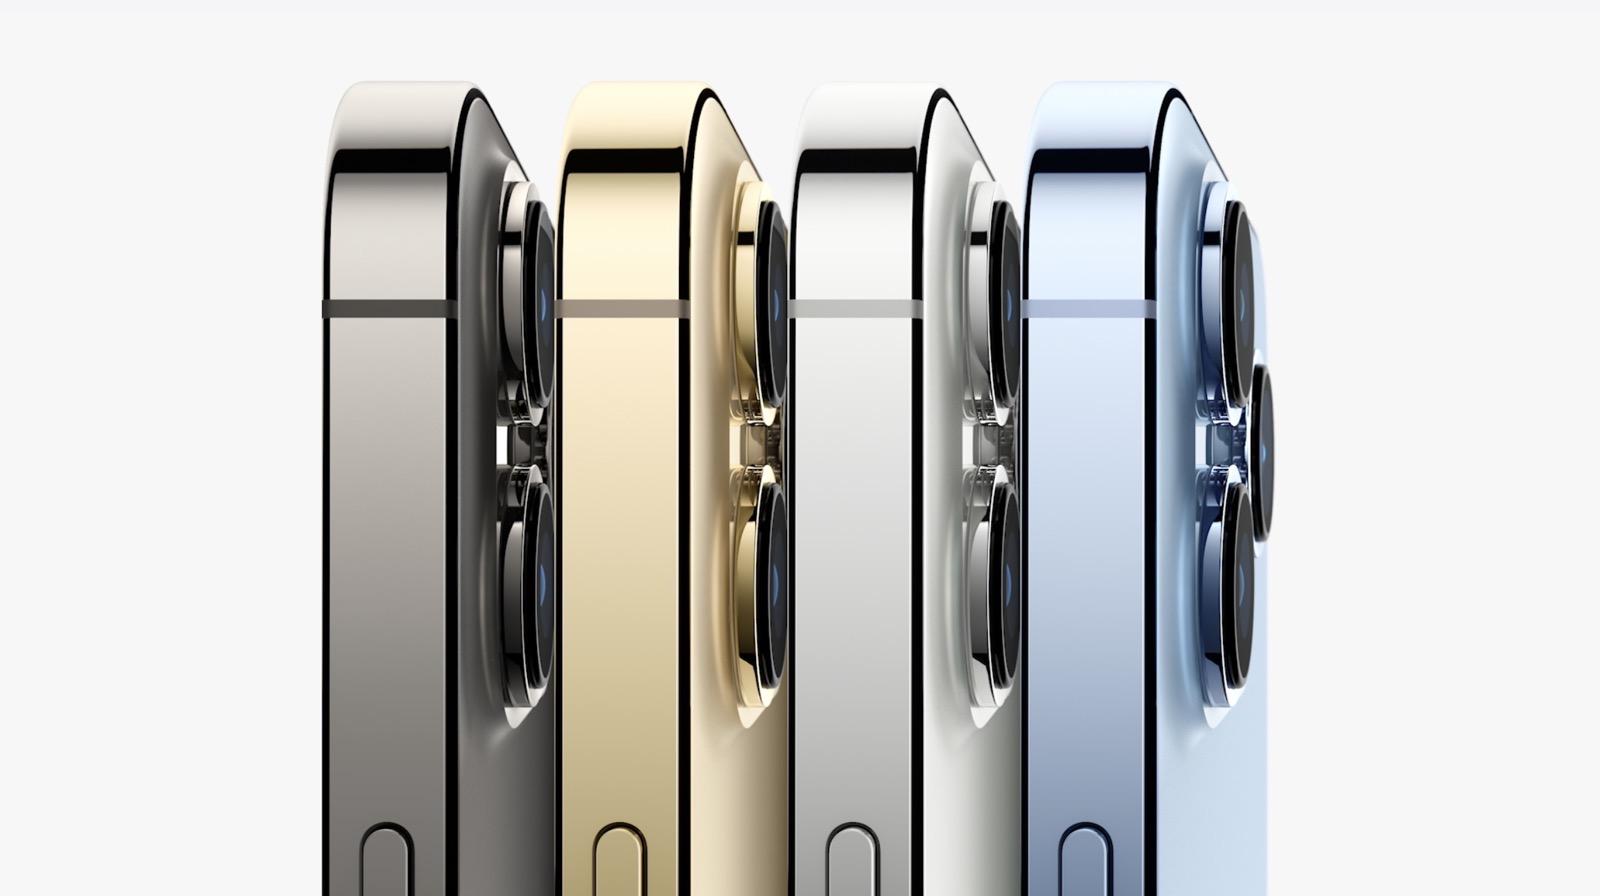 iPhone 13 Proのカラバリ